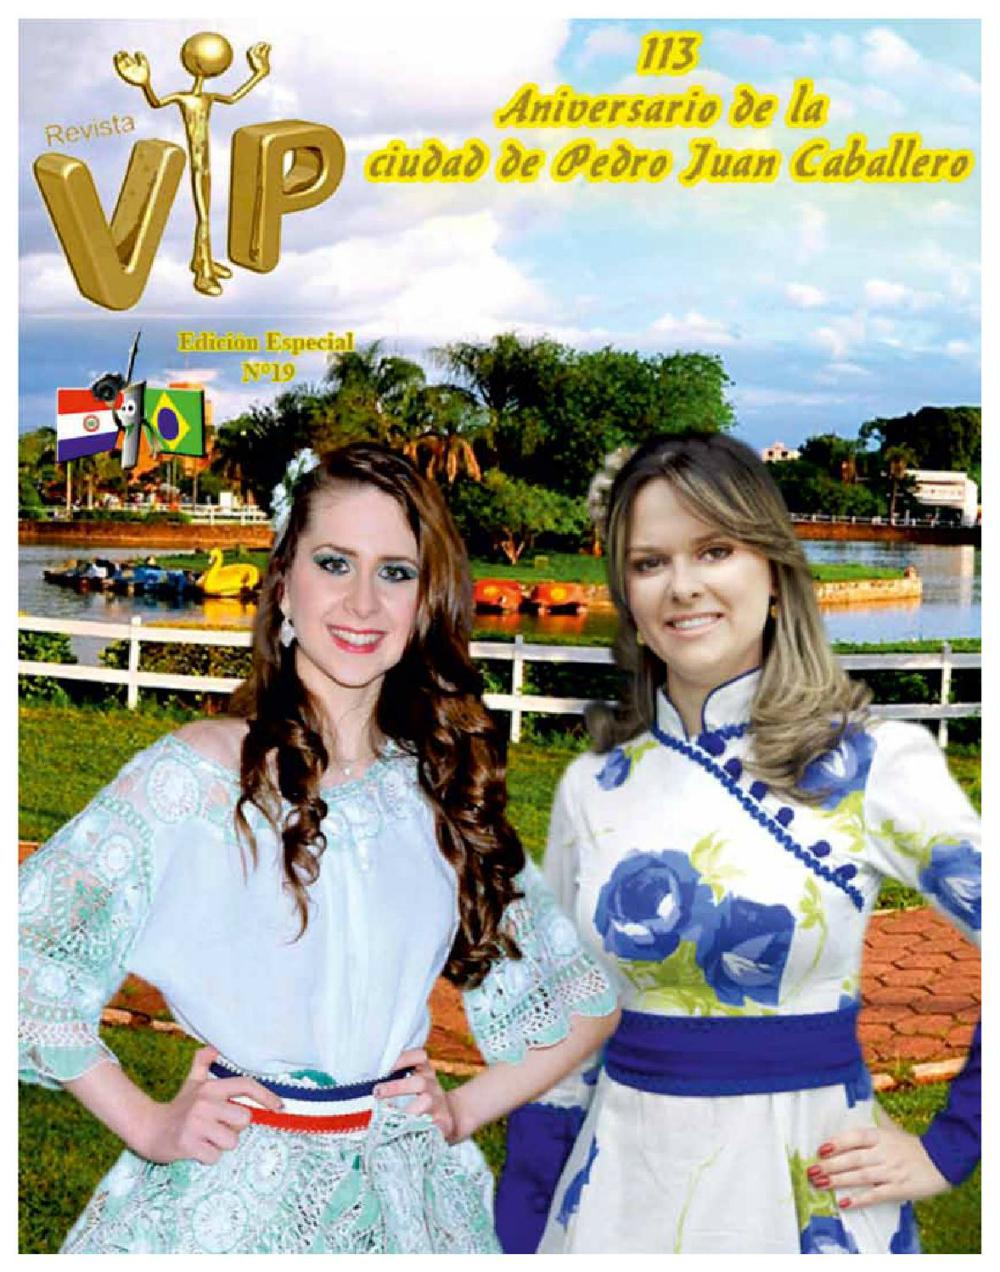 Vip 19 Paraguay